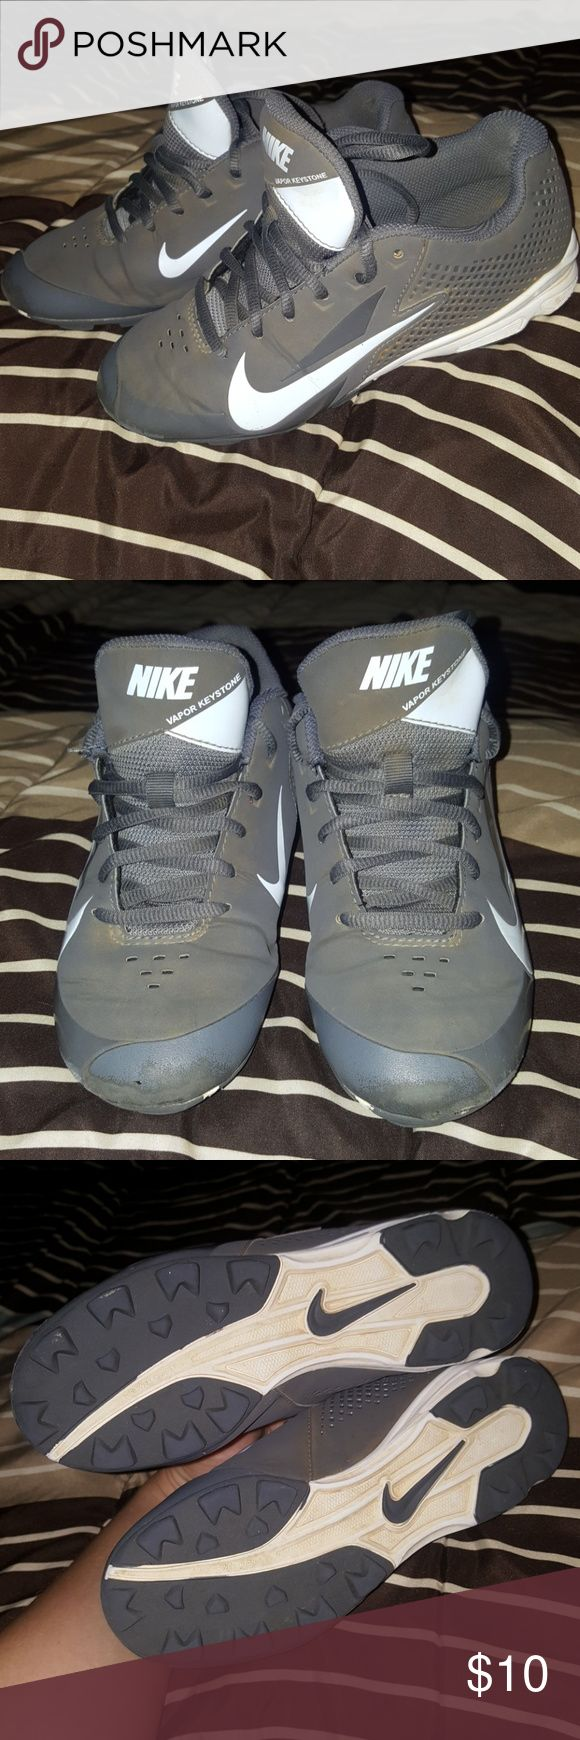 Nike Vapor Keystone Baseball Cleats White and grey Nike baseball cleats size 3.5 Nike Shoes Sneakers